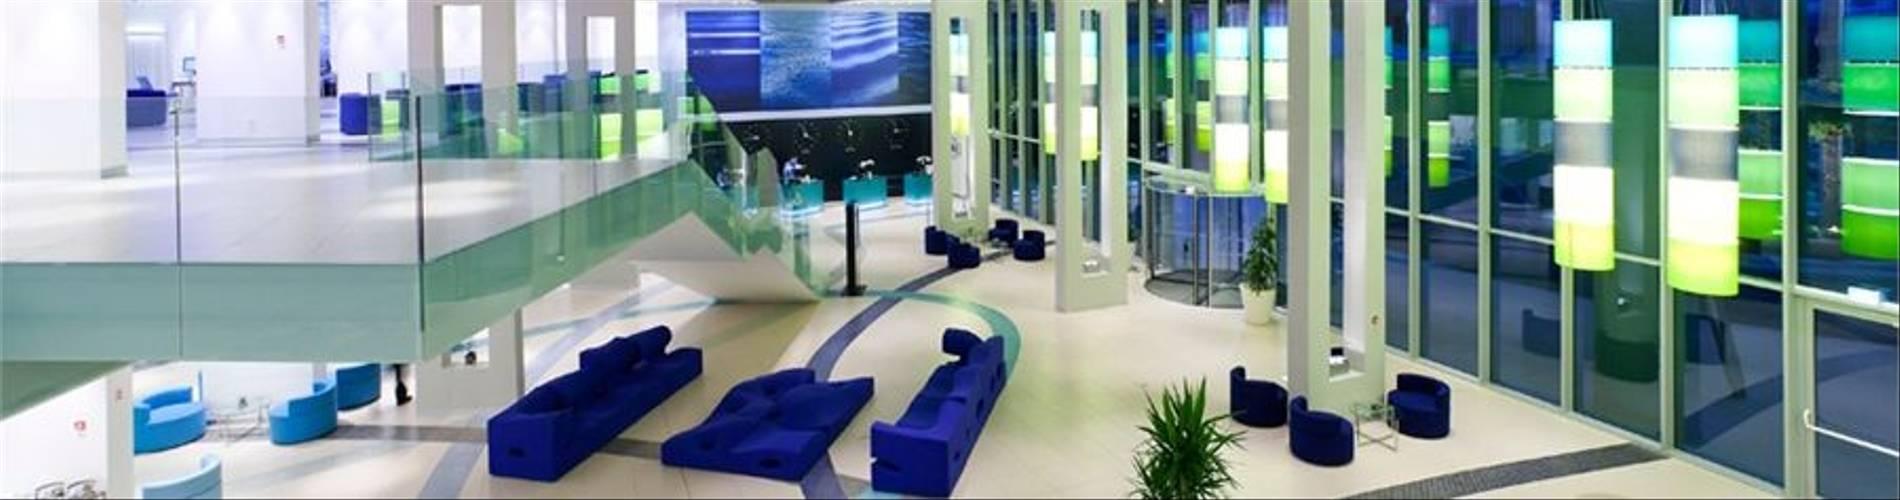 croatia_dalmatia_split_hotel_radisson_blu_resort_006.jpg